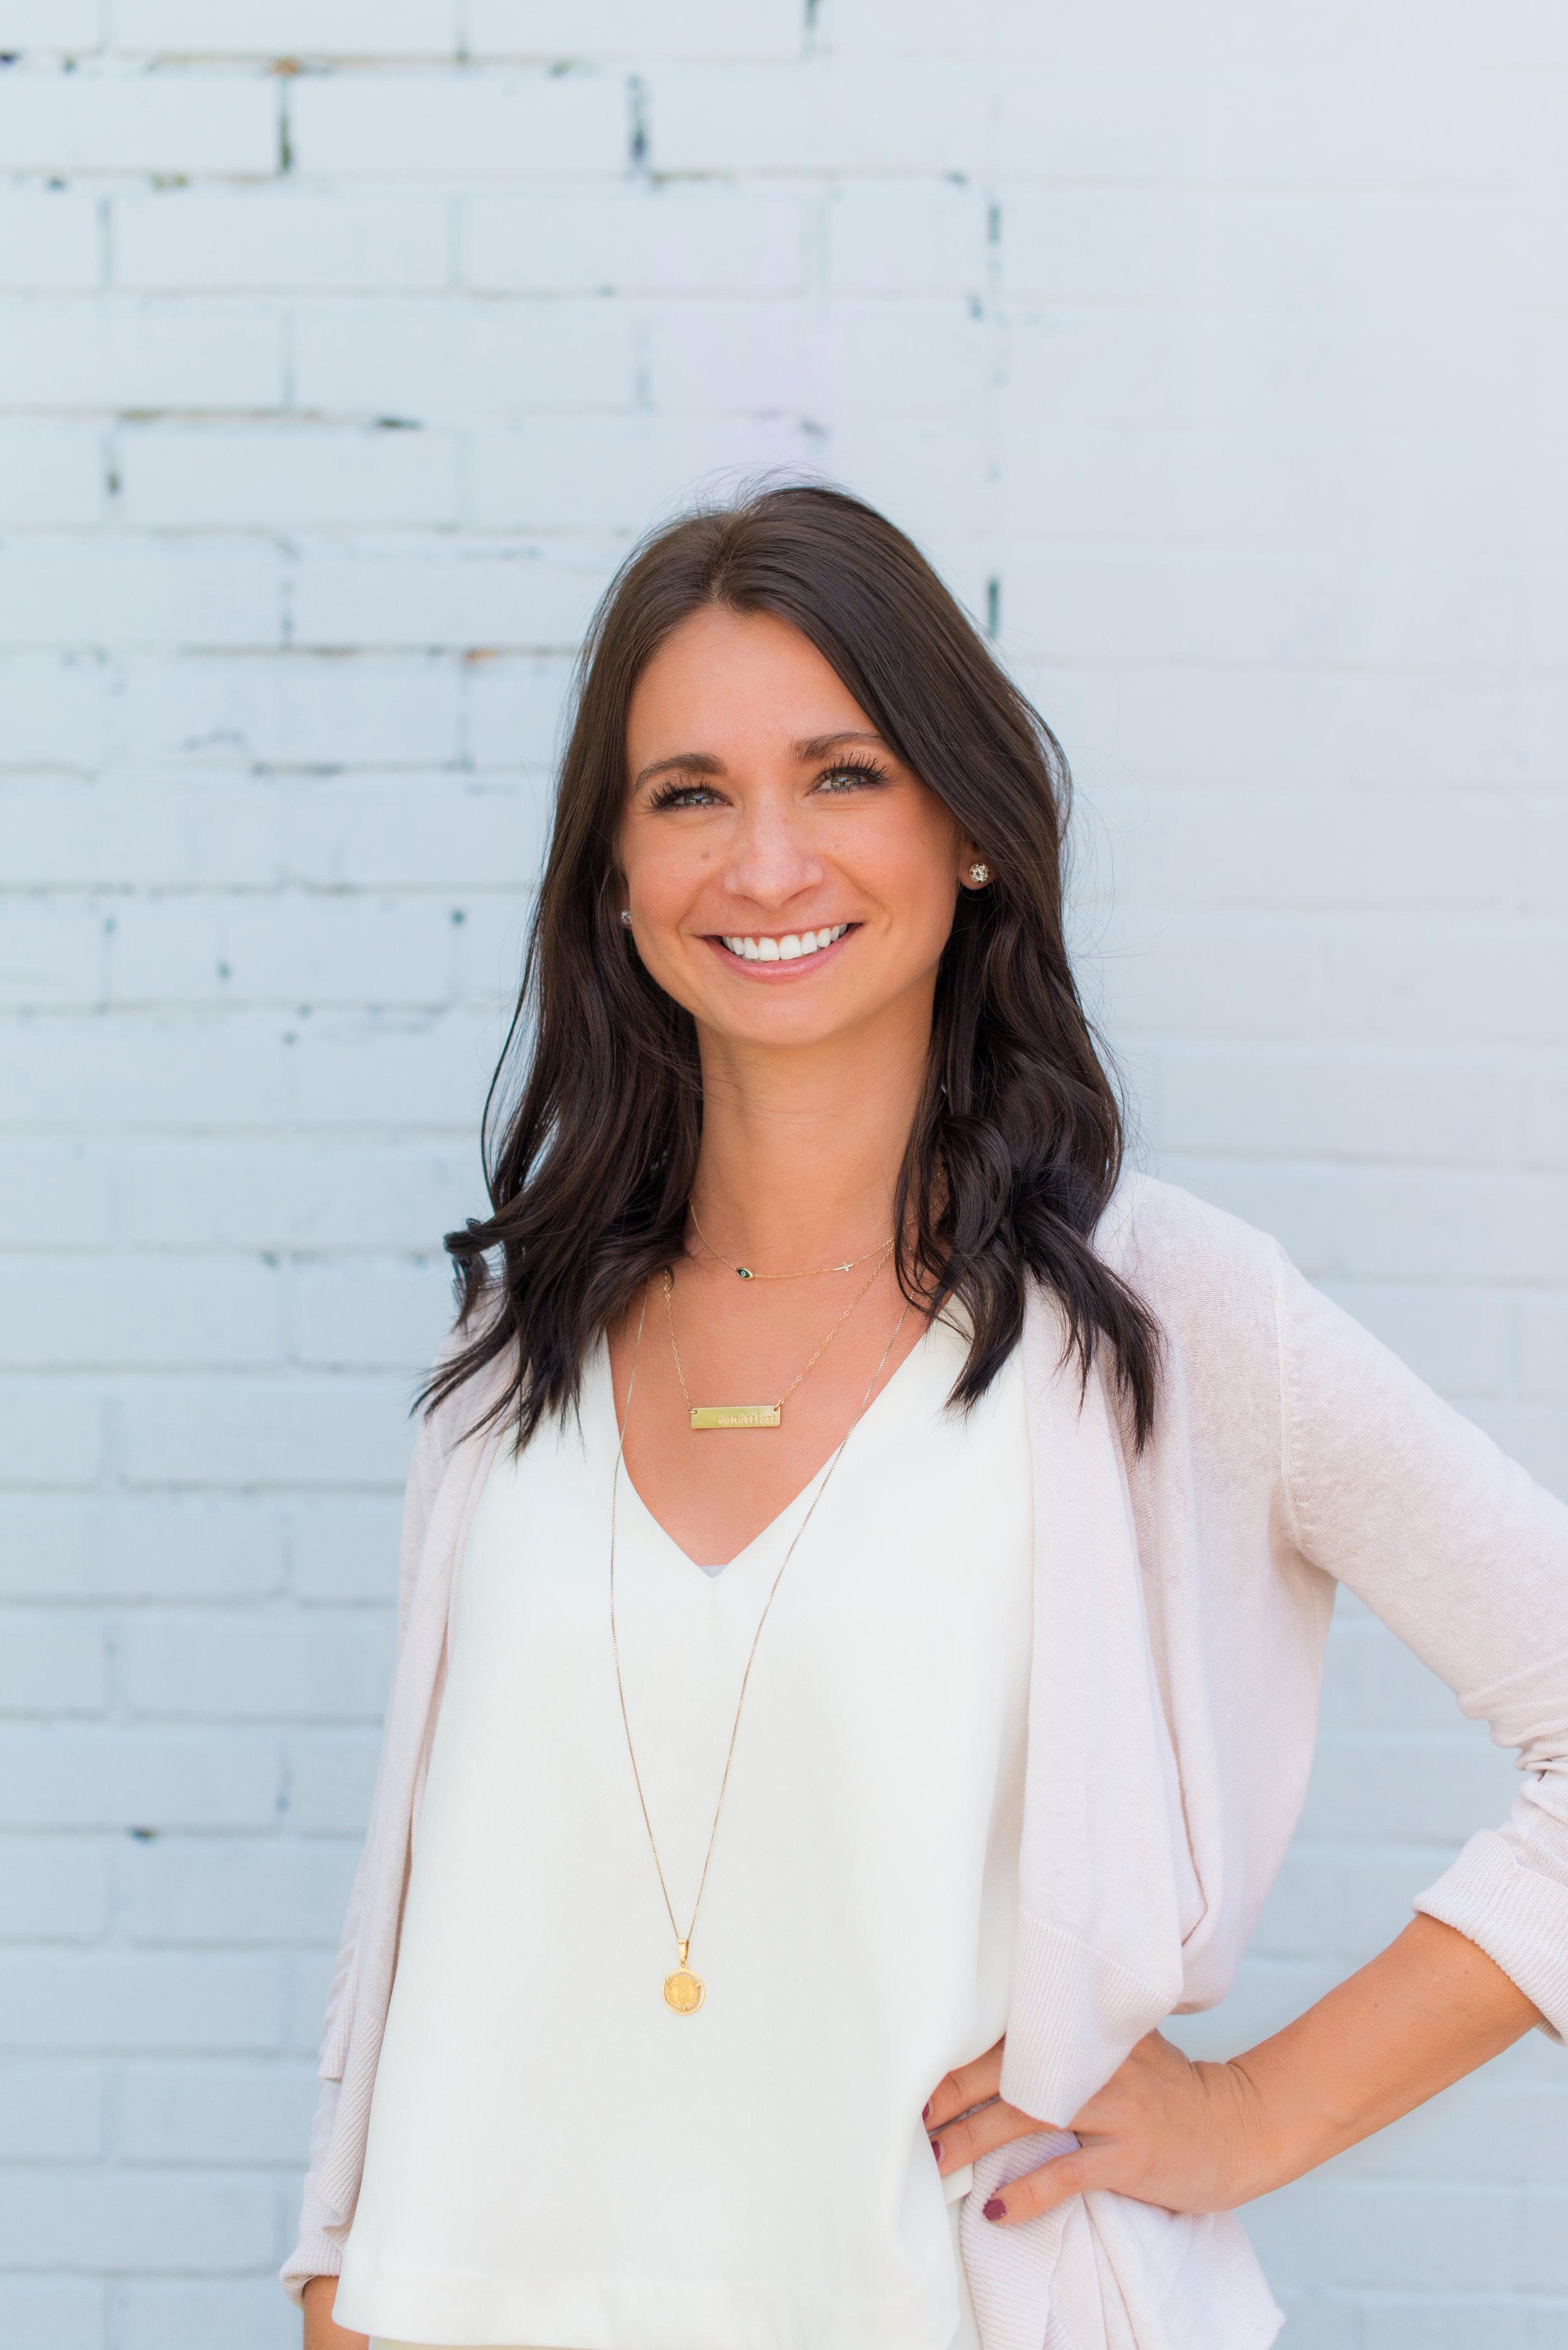 The Host: Shantel Khleif